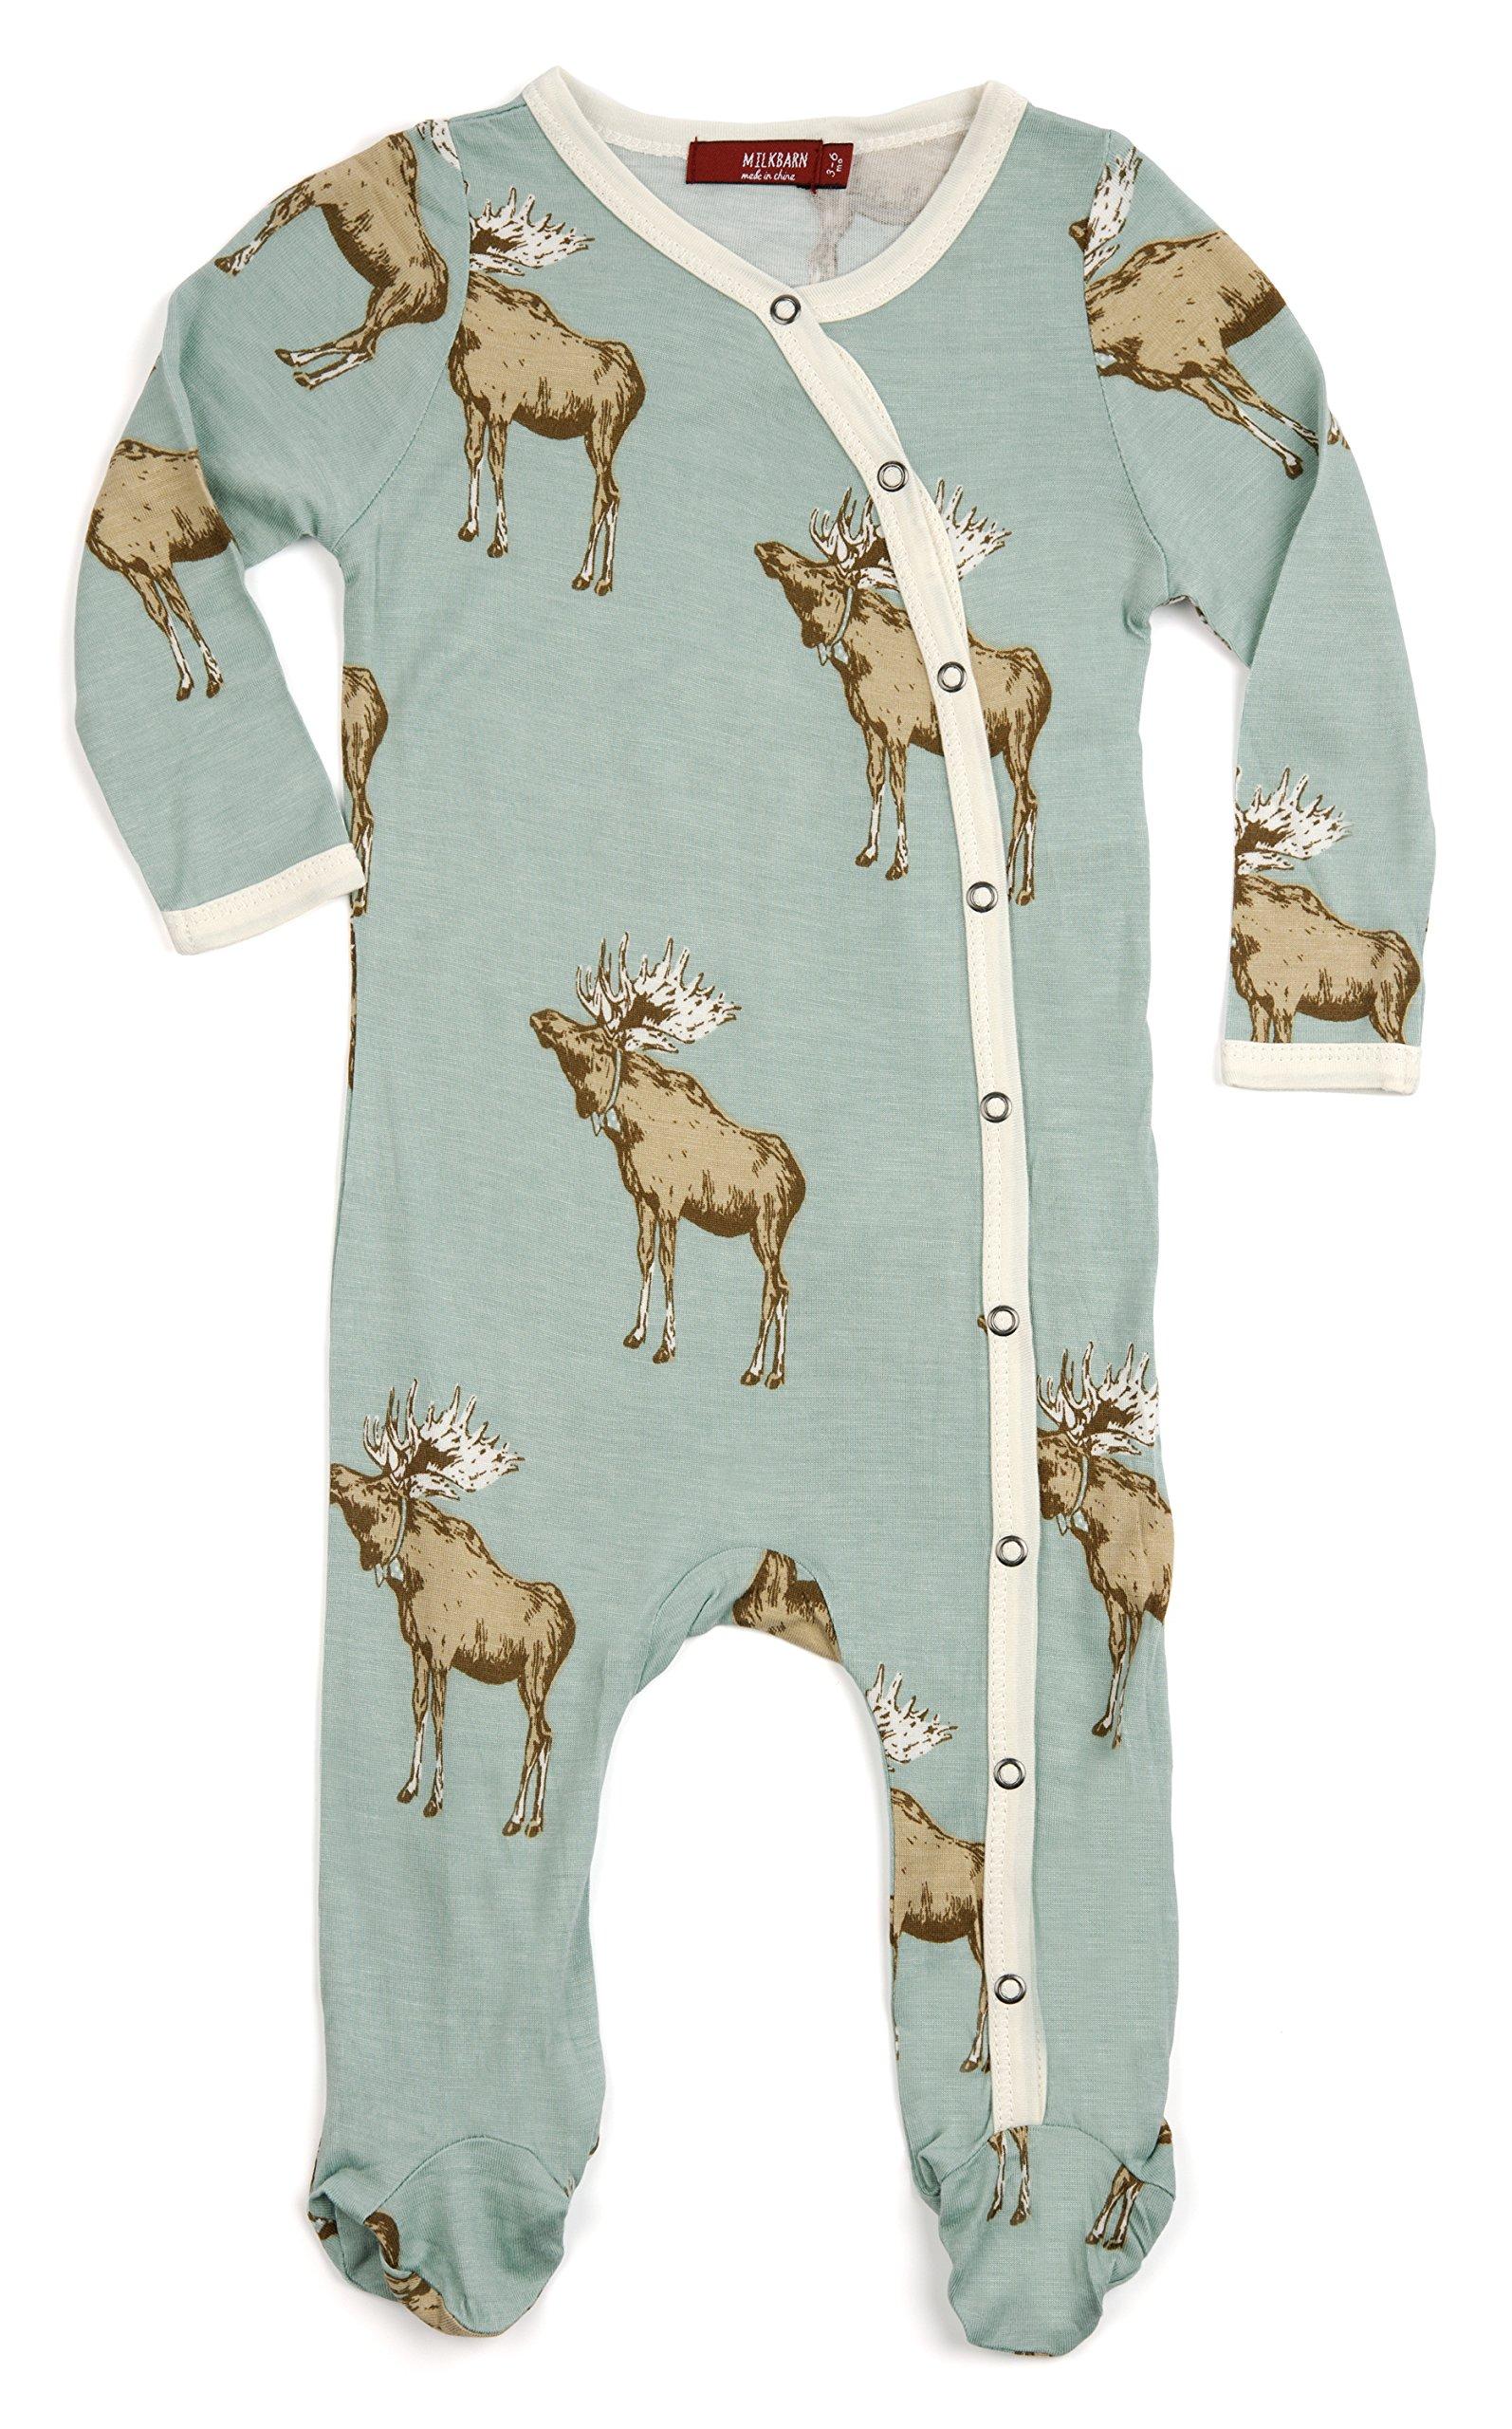 Milkbarn Bamboo Footed Romper ''Bowtie Moose'' (3-6 Months)